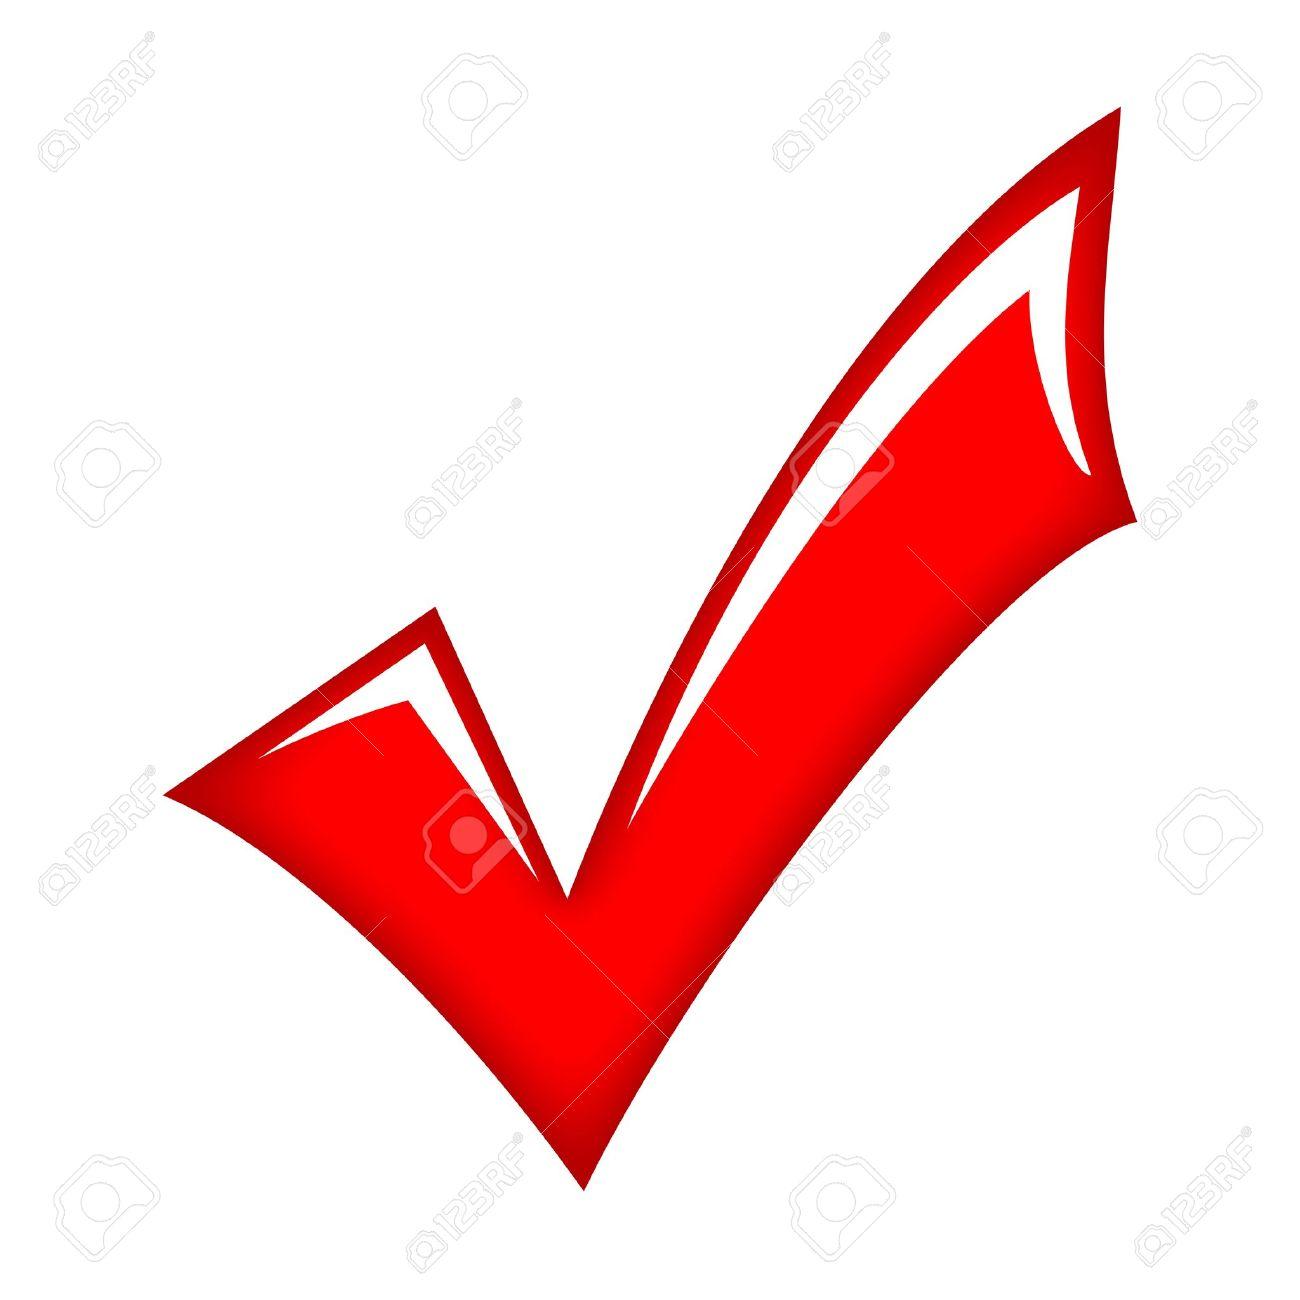 vector red check mark royalty free cliparts vectors and stock rh 123rf com check mark clip art for excel check mark clip art free